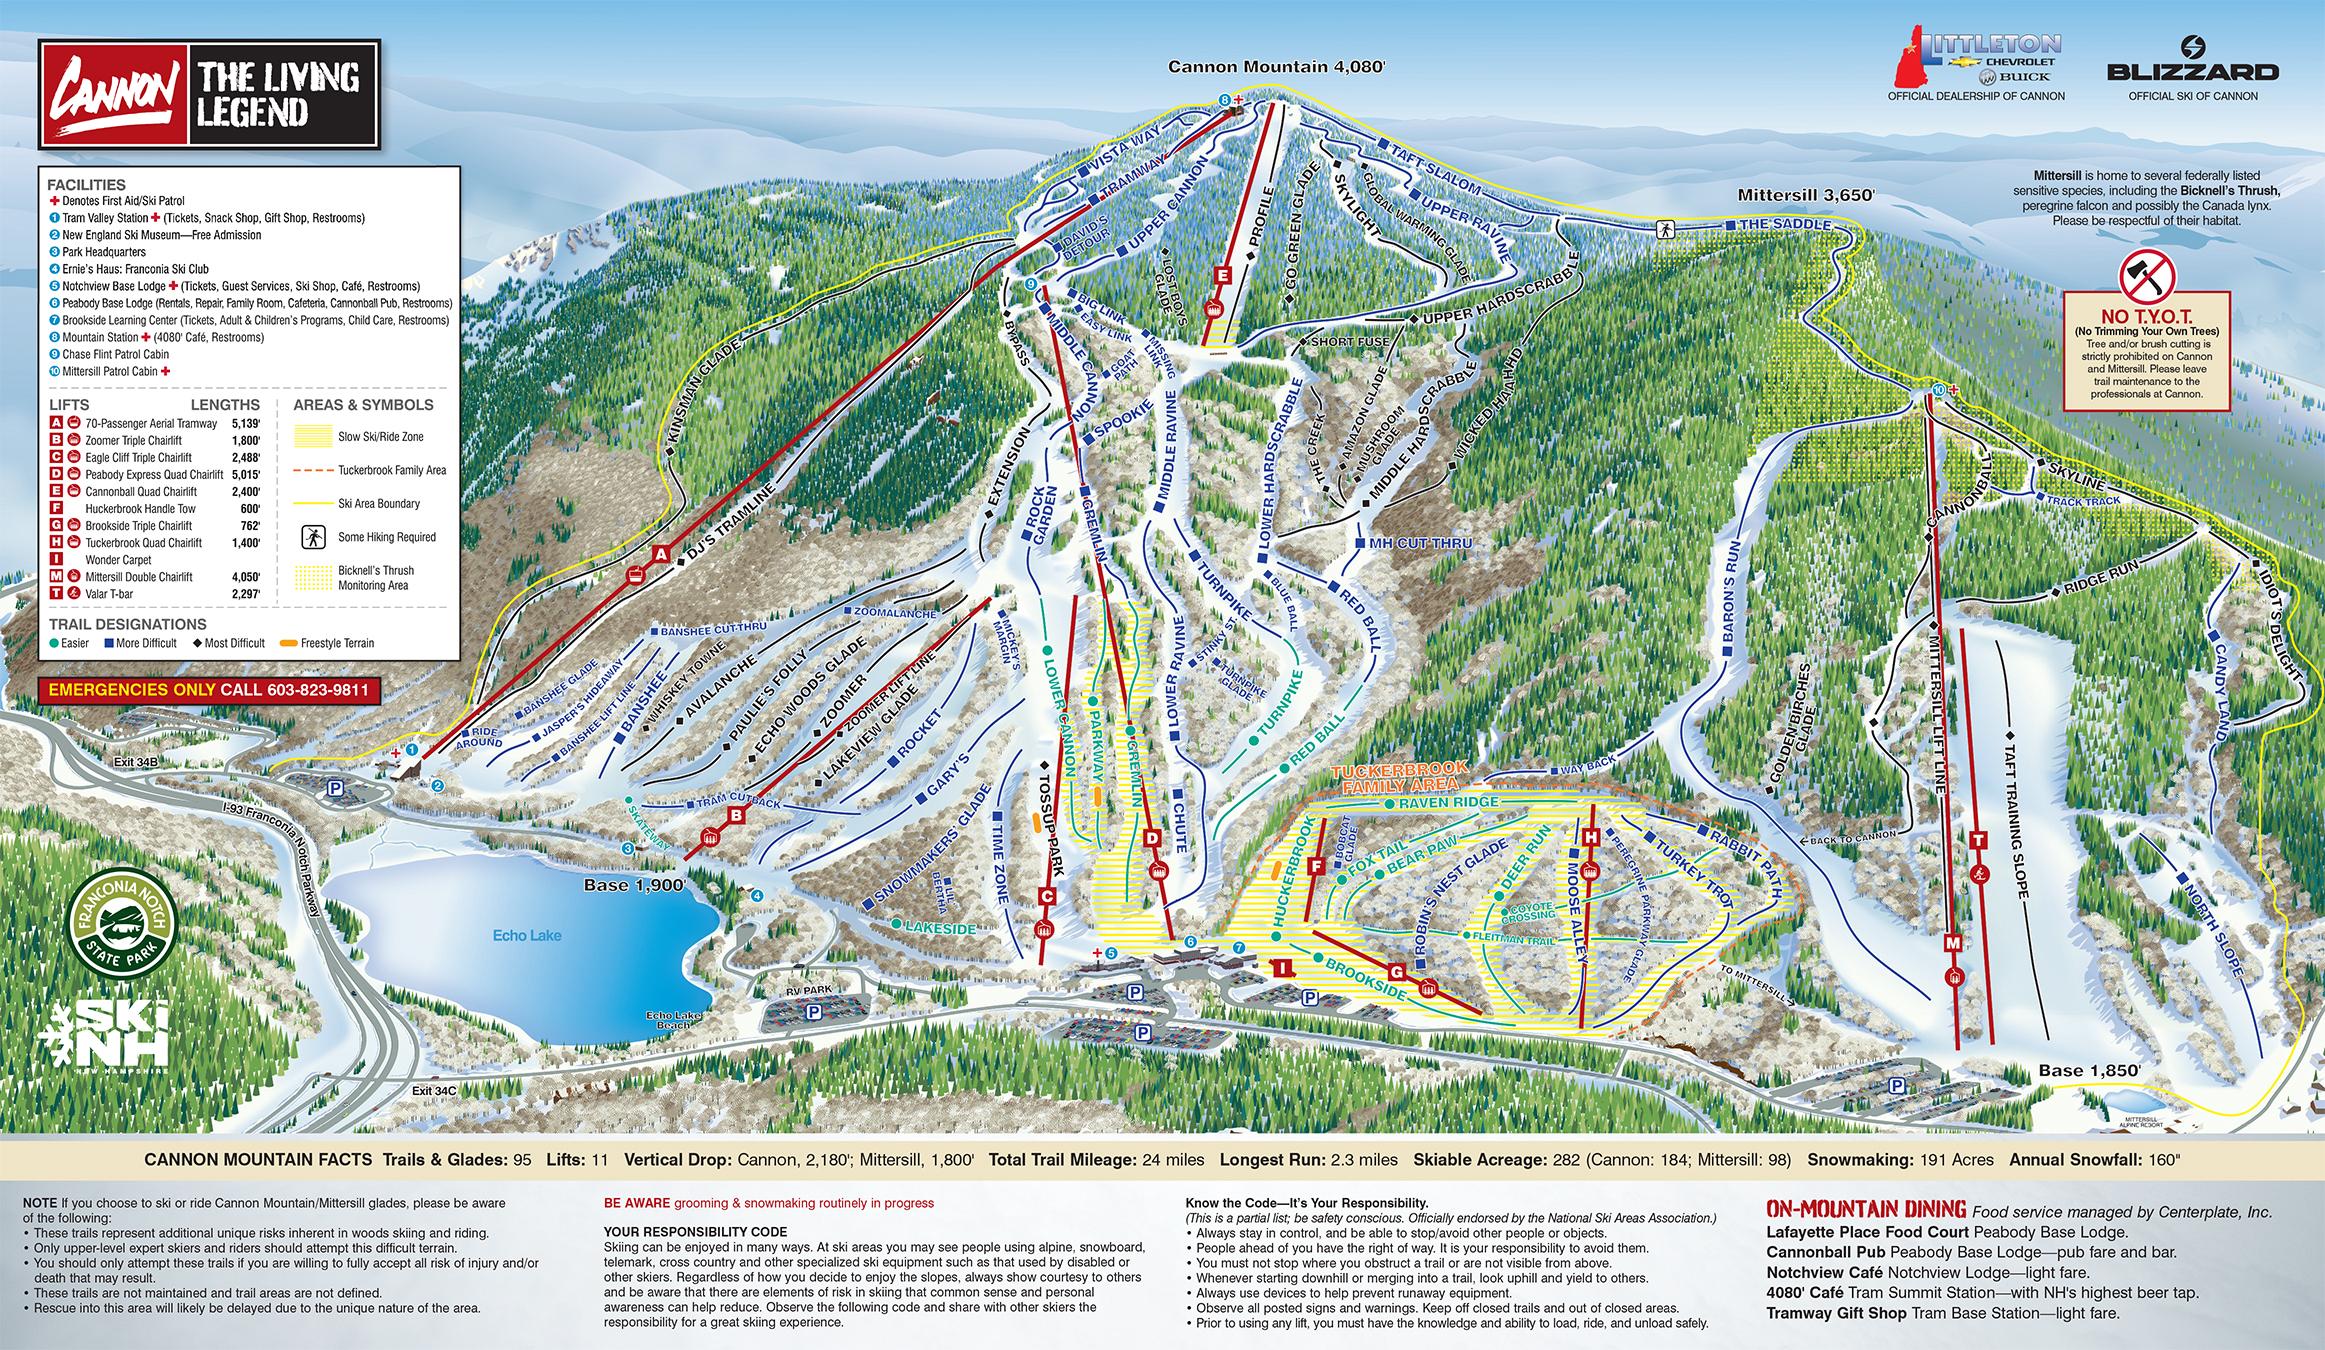 Cannon mountain ski trail map free download cannon mountain ski map publicscrutiny Choice Image